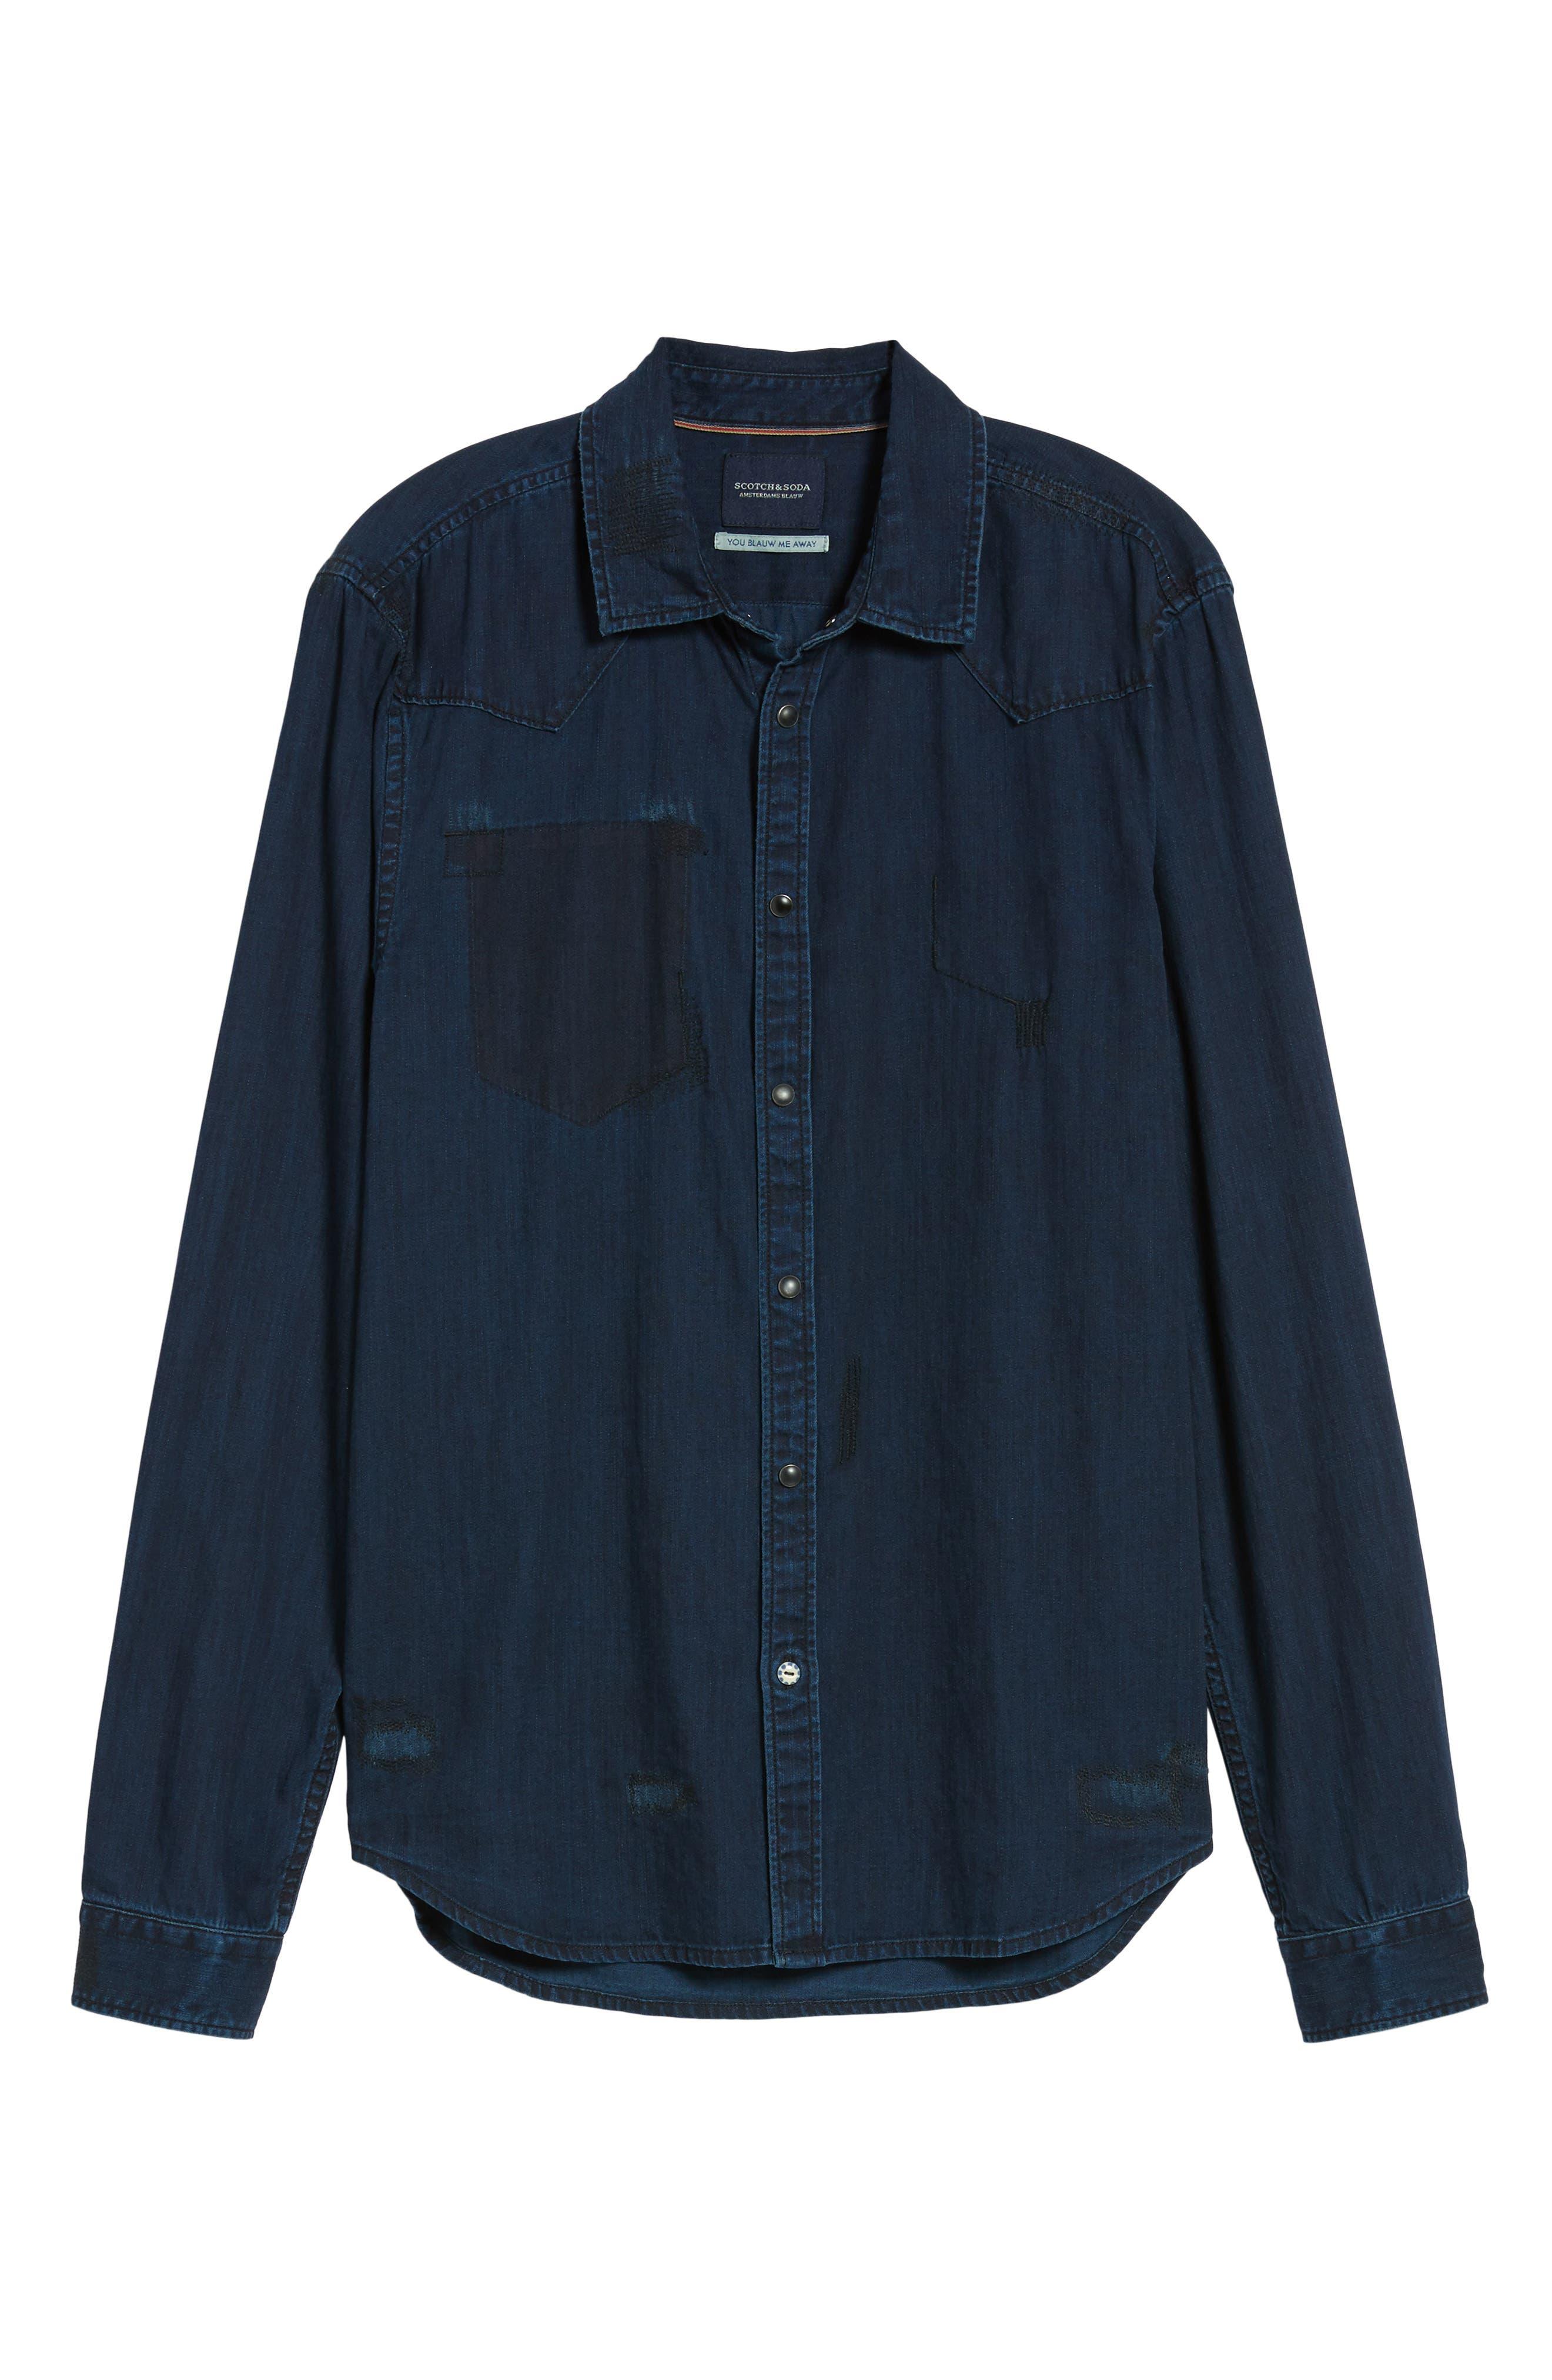 Pocketless Western Denim Shirt,                             Alternate thumbnail 6, color,                             Midnight